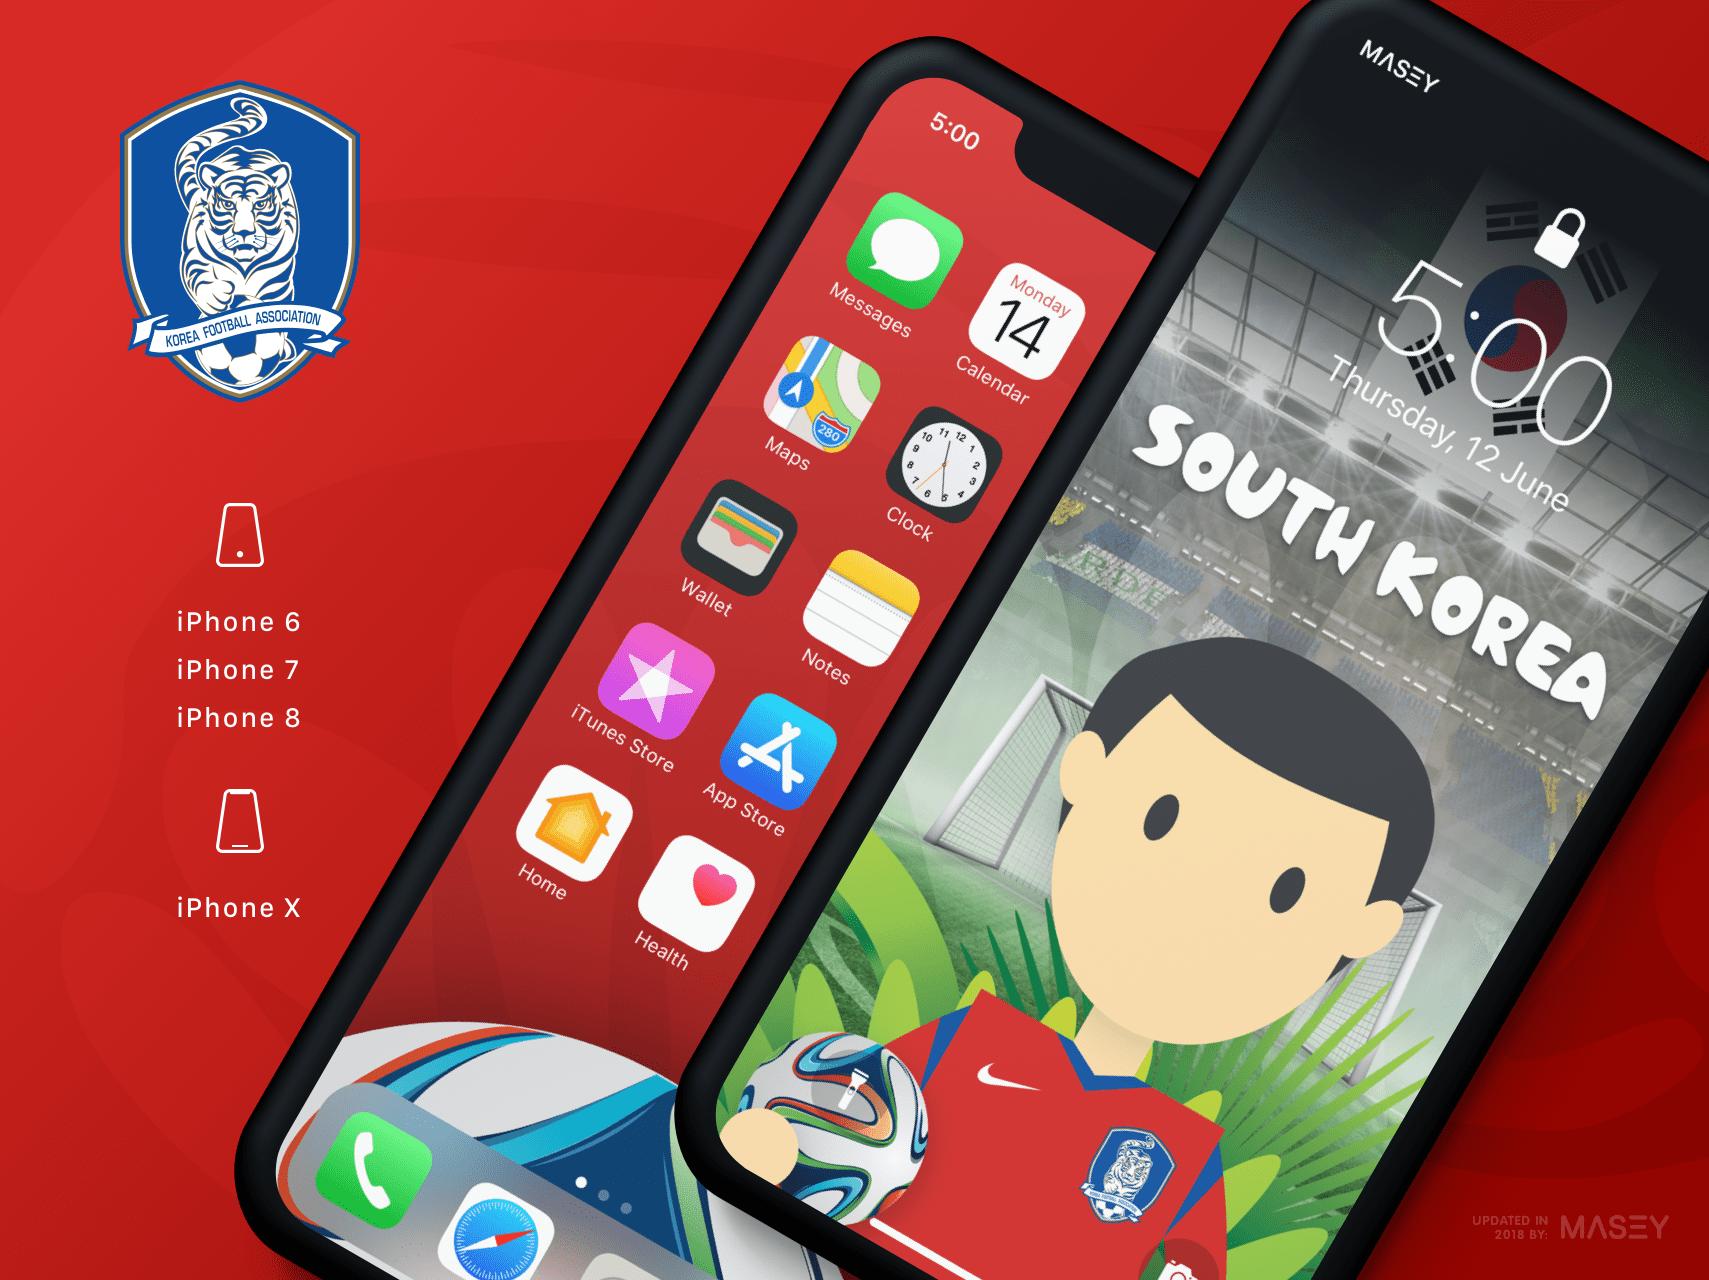 Team South Korea iPhone Wallpaper